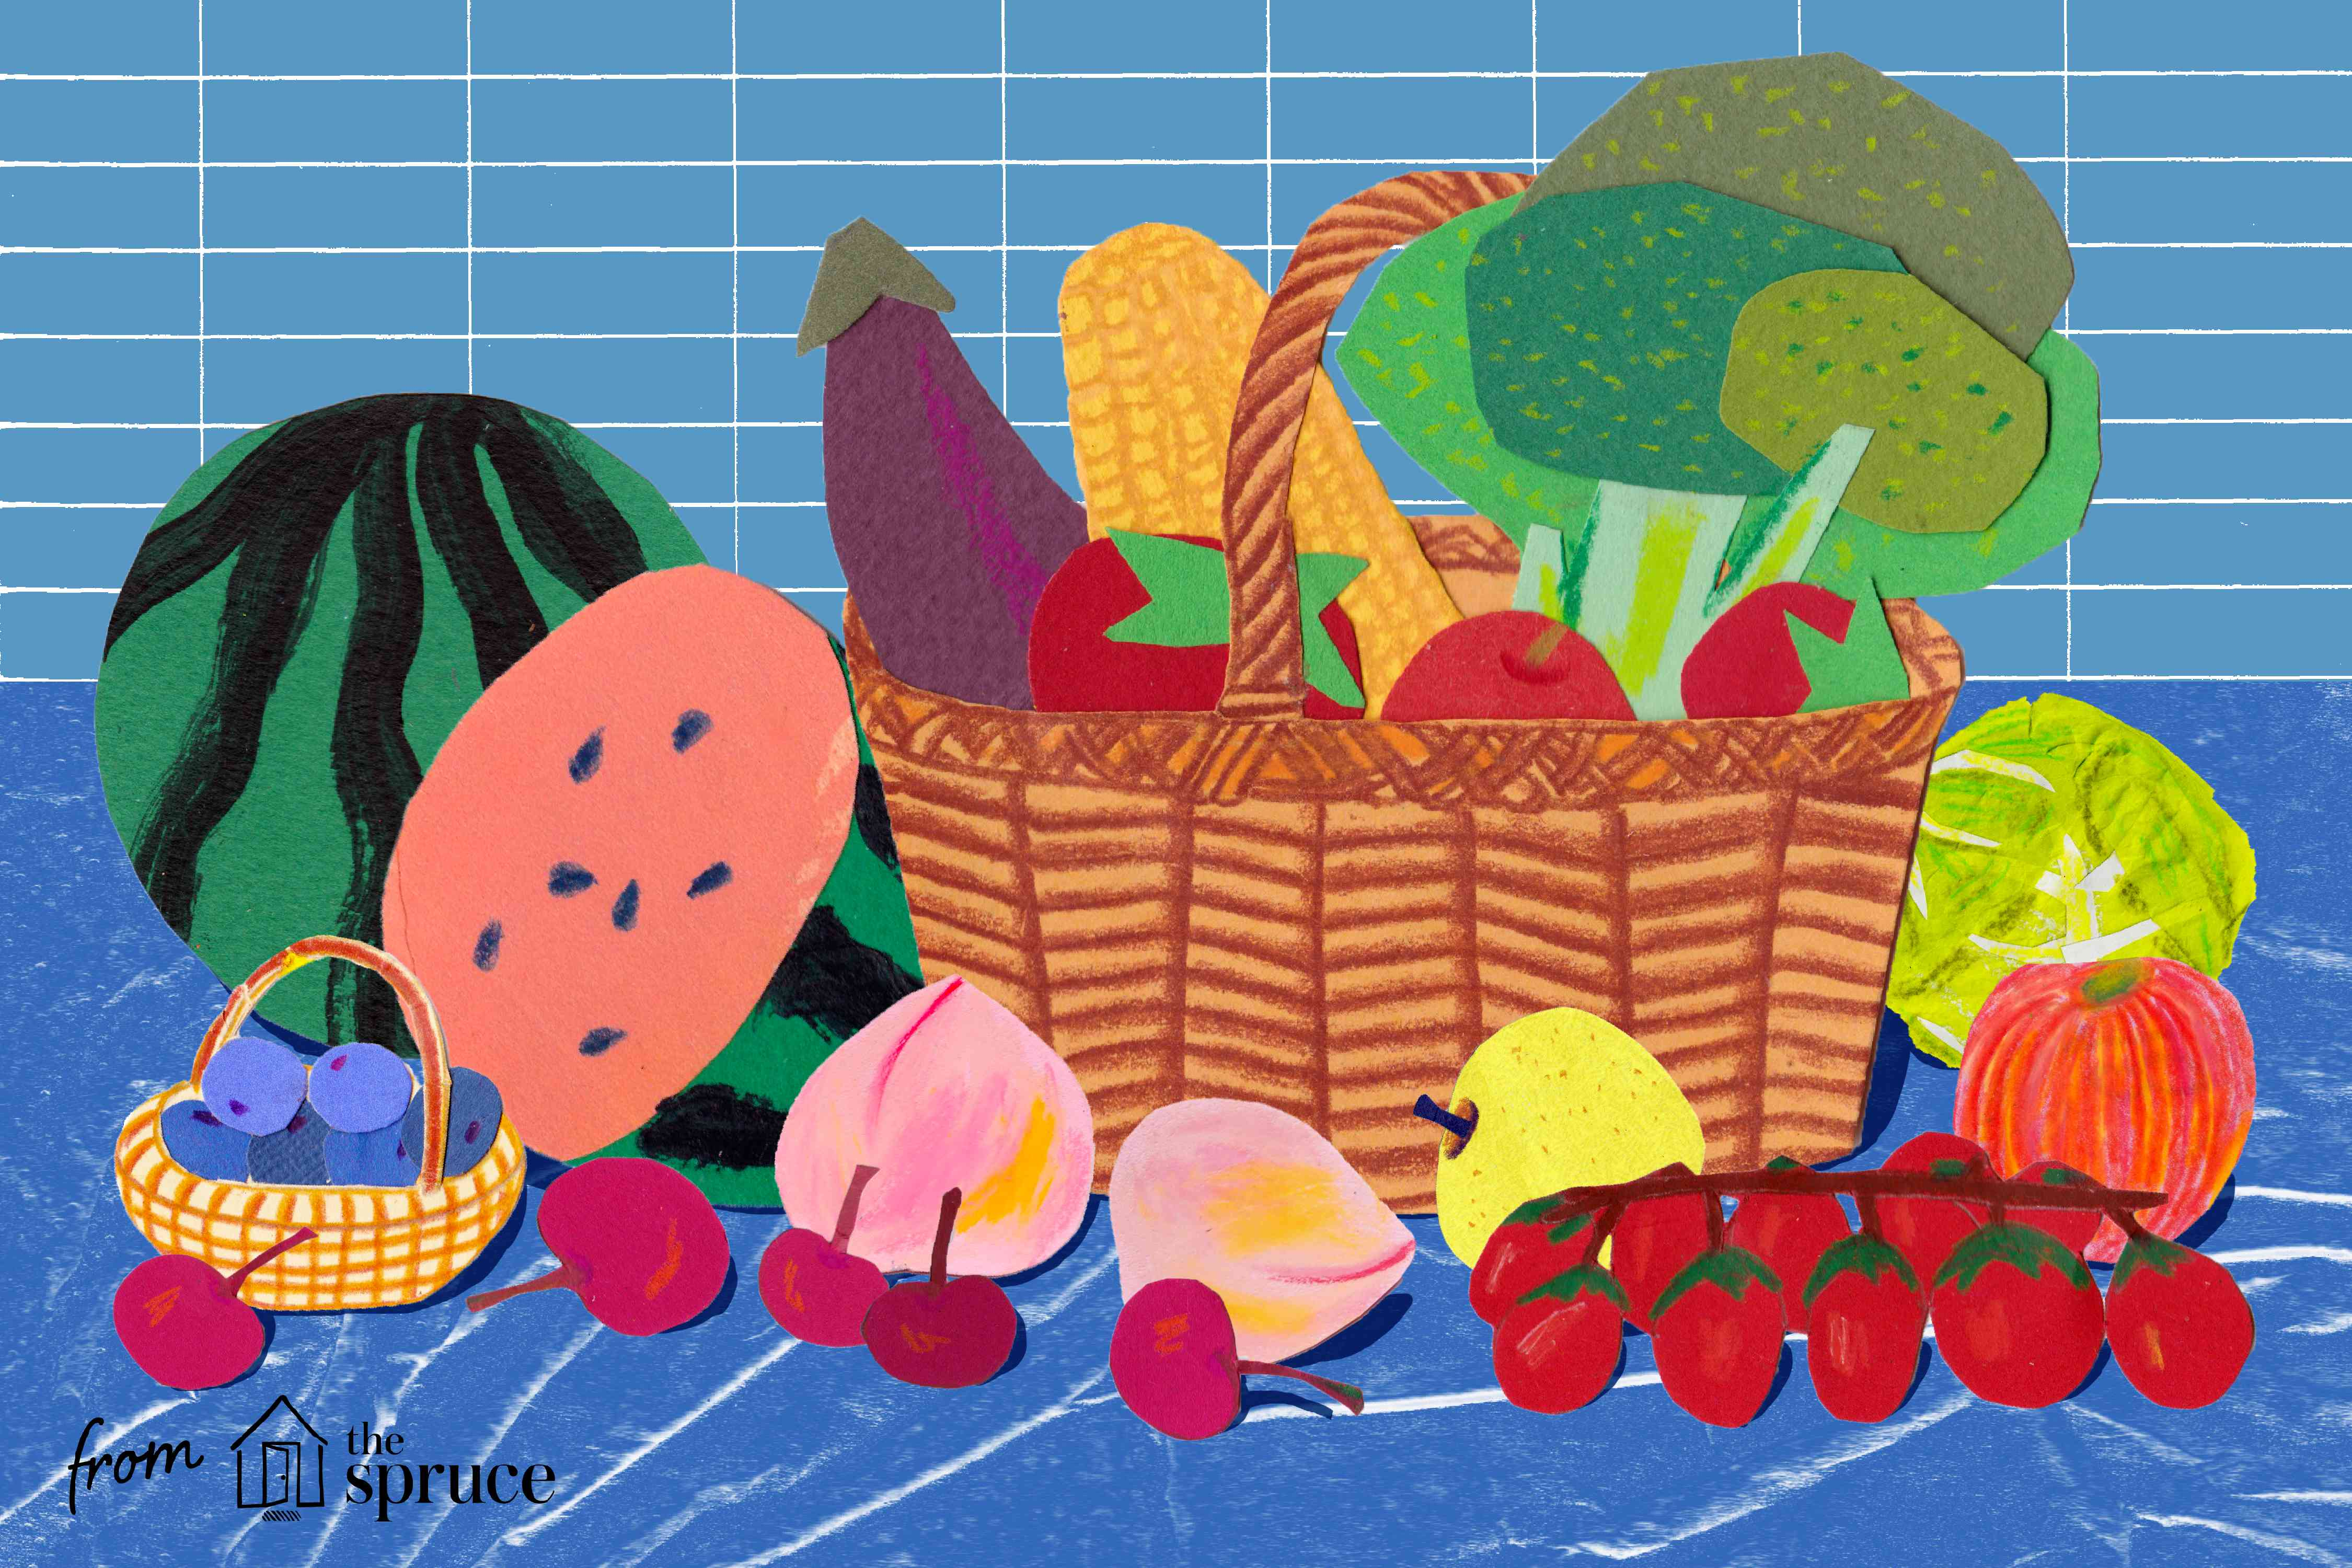 Buying in season produce